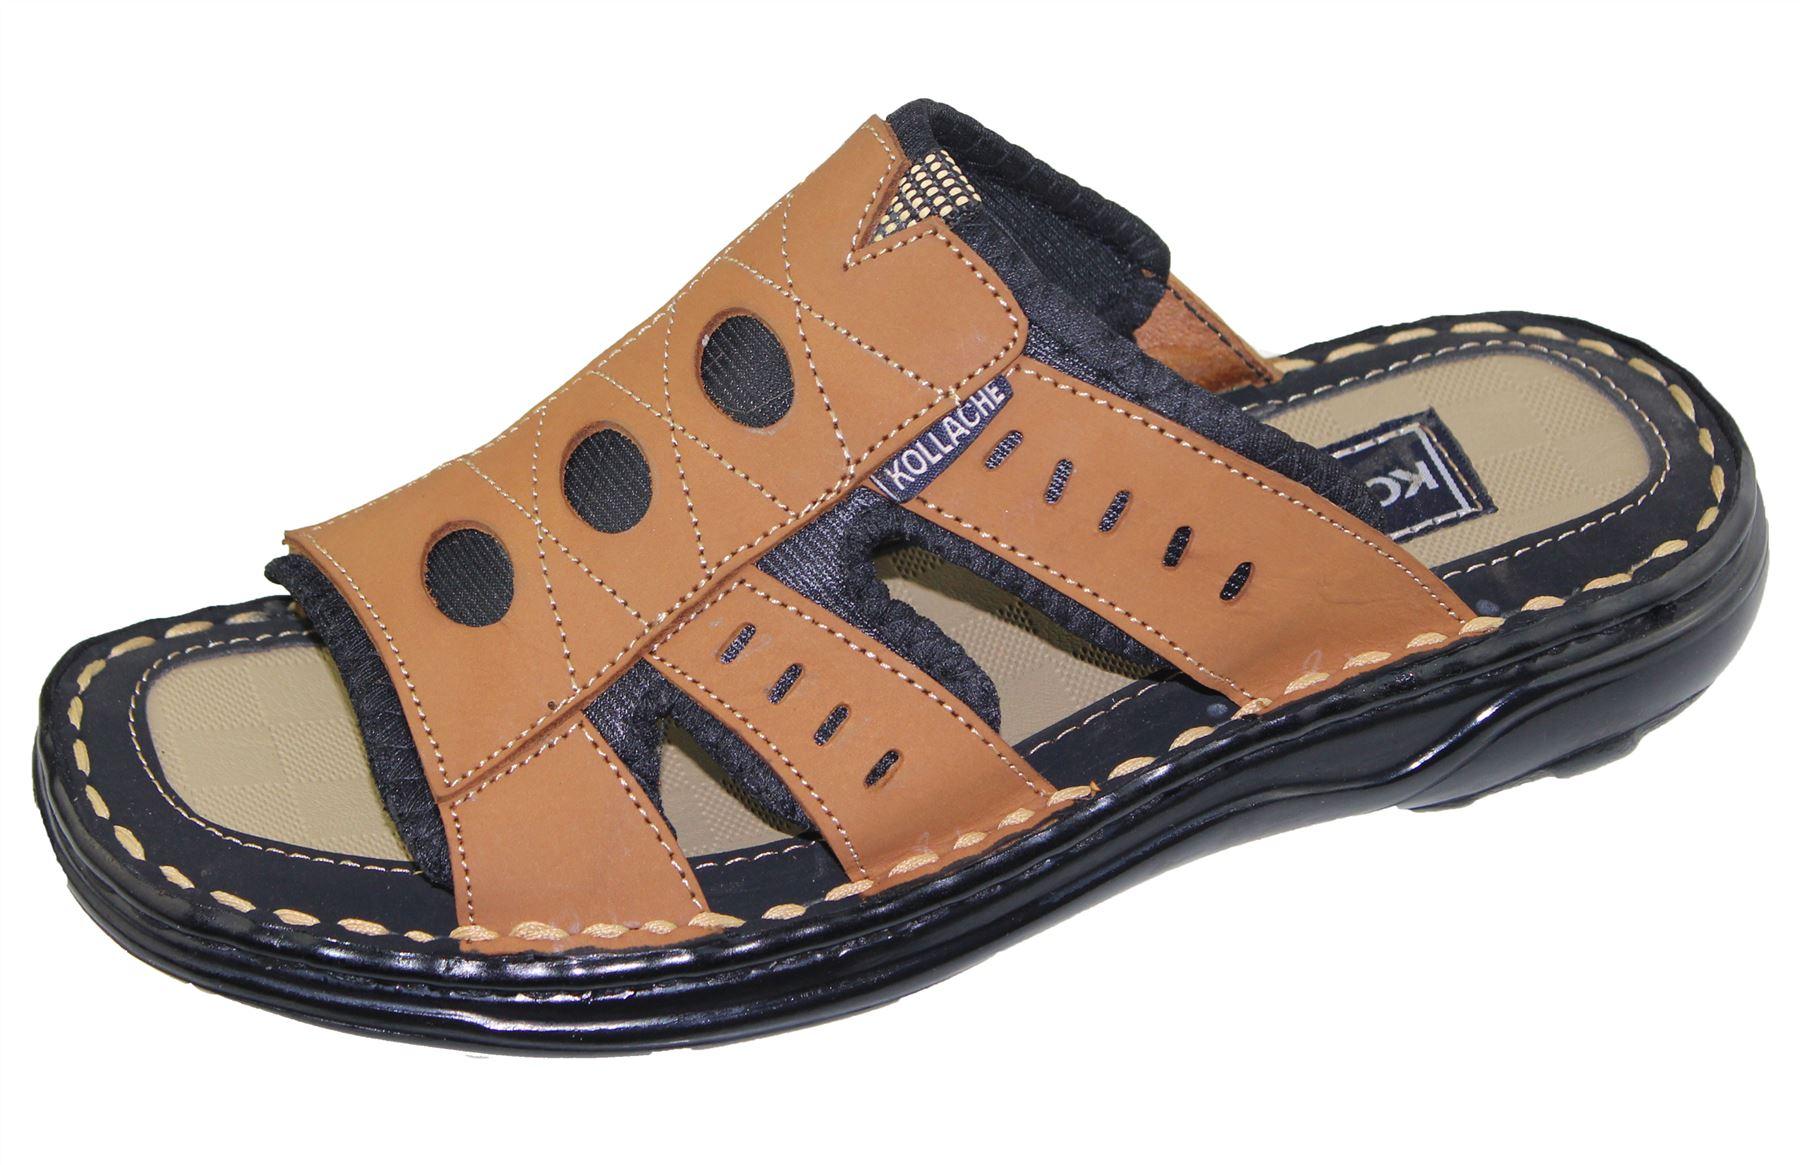 Mens-Slipper-Sandal-Sports-Beach-Buckle-Walking-Fashion-Summer-Casual-Shoes-Size miniatura 31